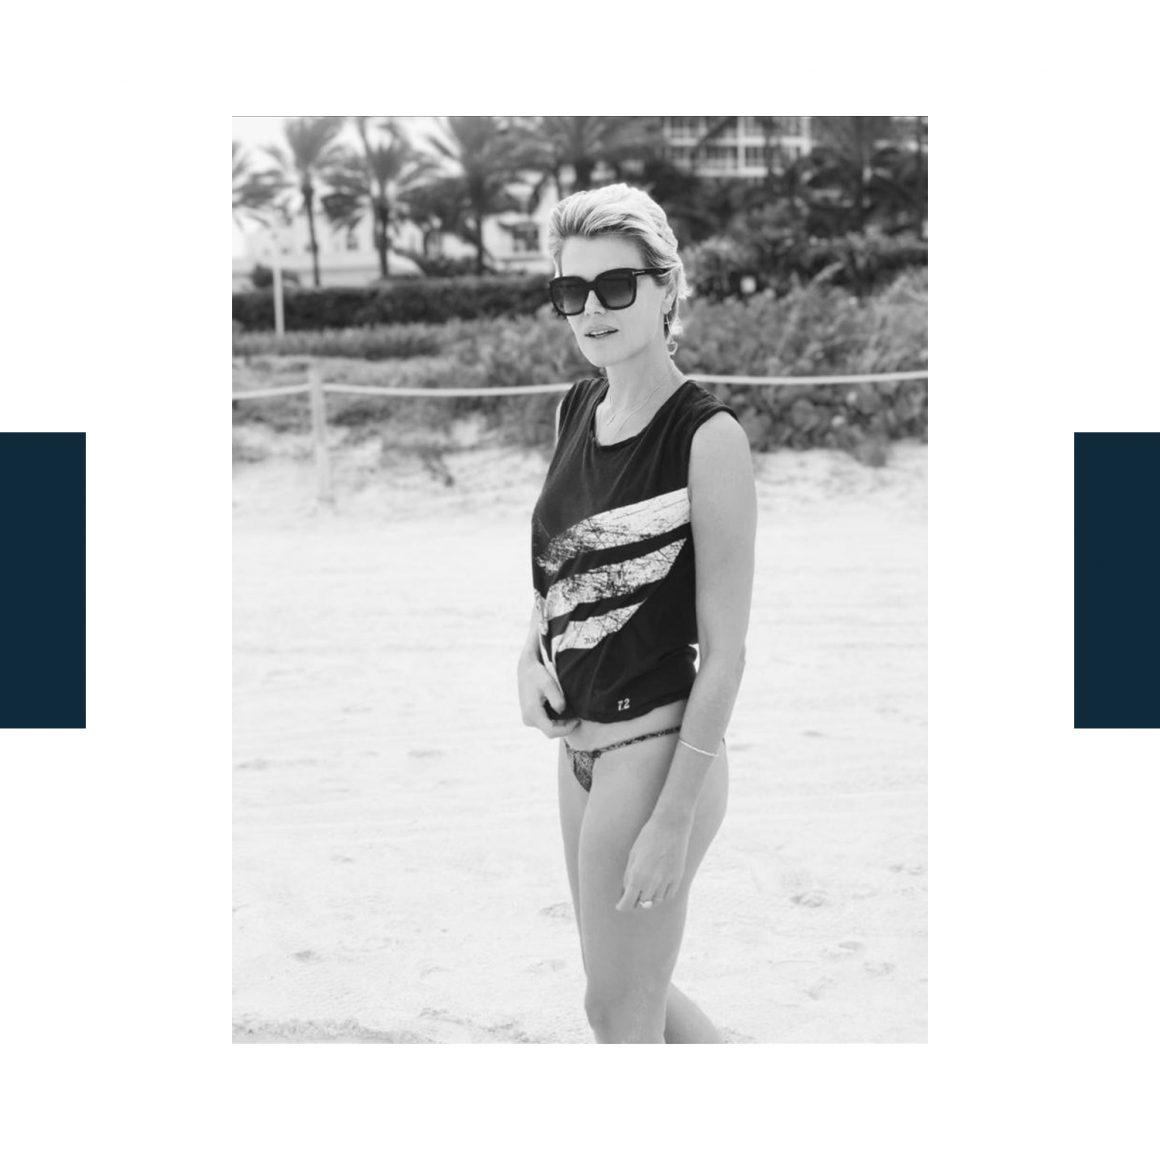 Ingrid Seynhaeve porte le tee-shirt Ruby de June7.2